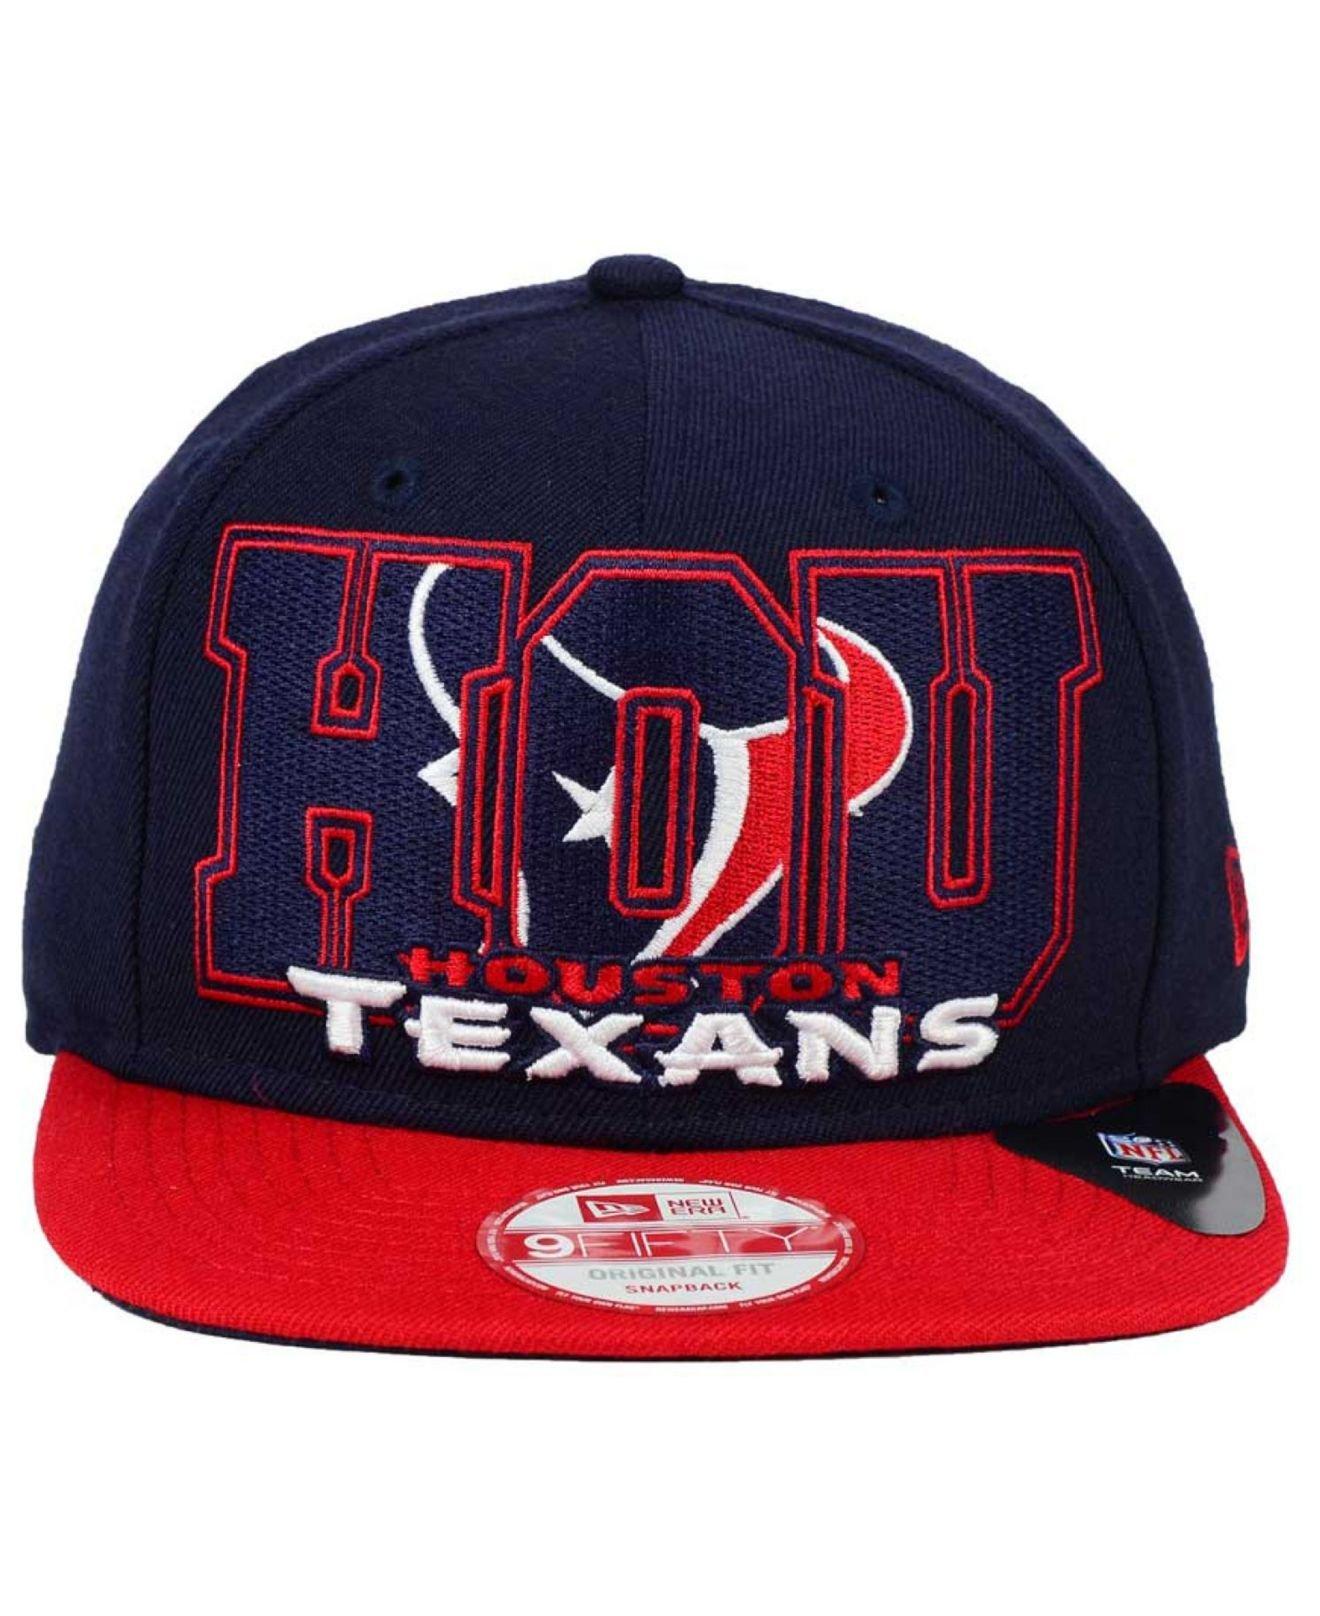 0021052493d65 Lyst - Ktz Houston Texans Big City 9fifty Snapback Cap in Blue for Men